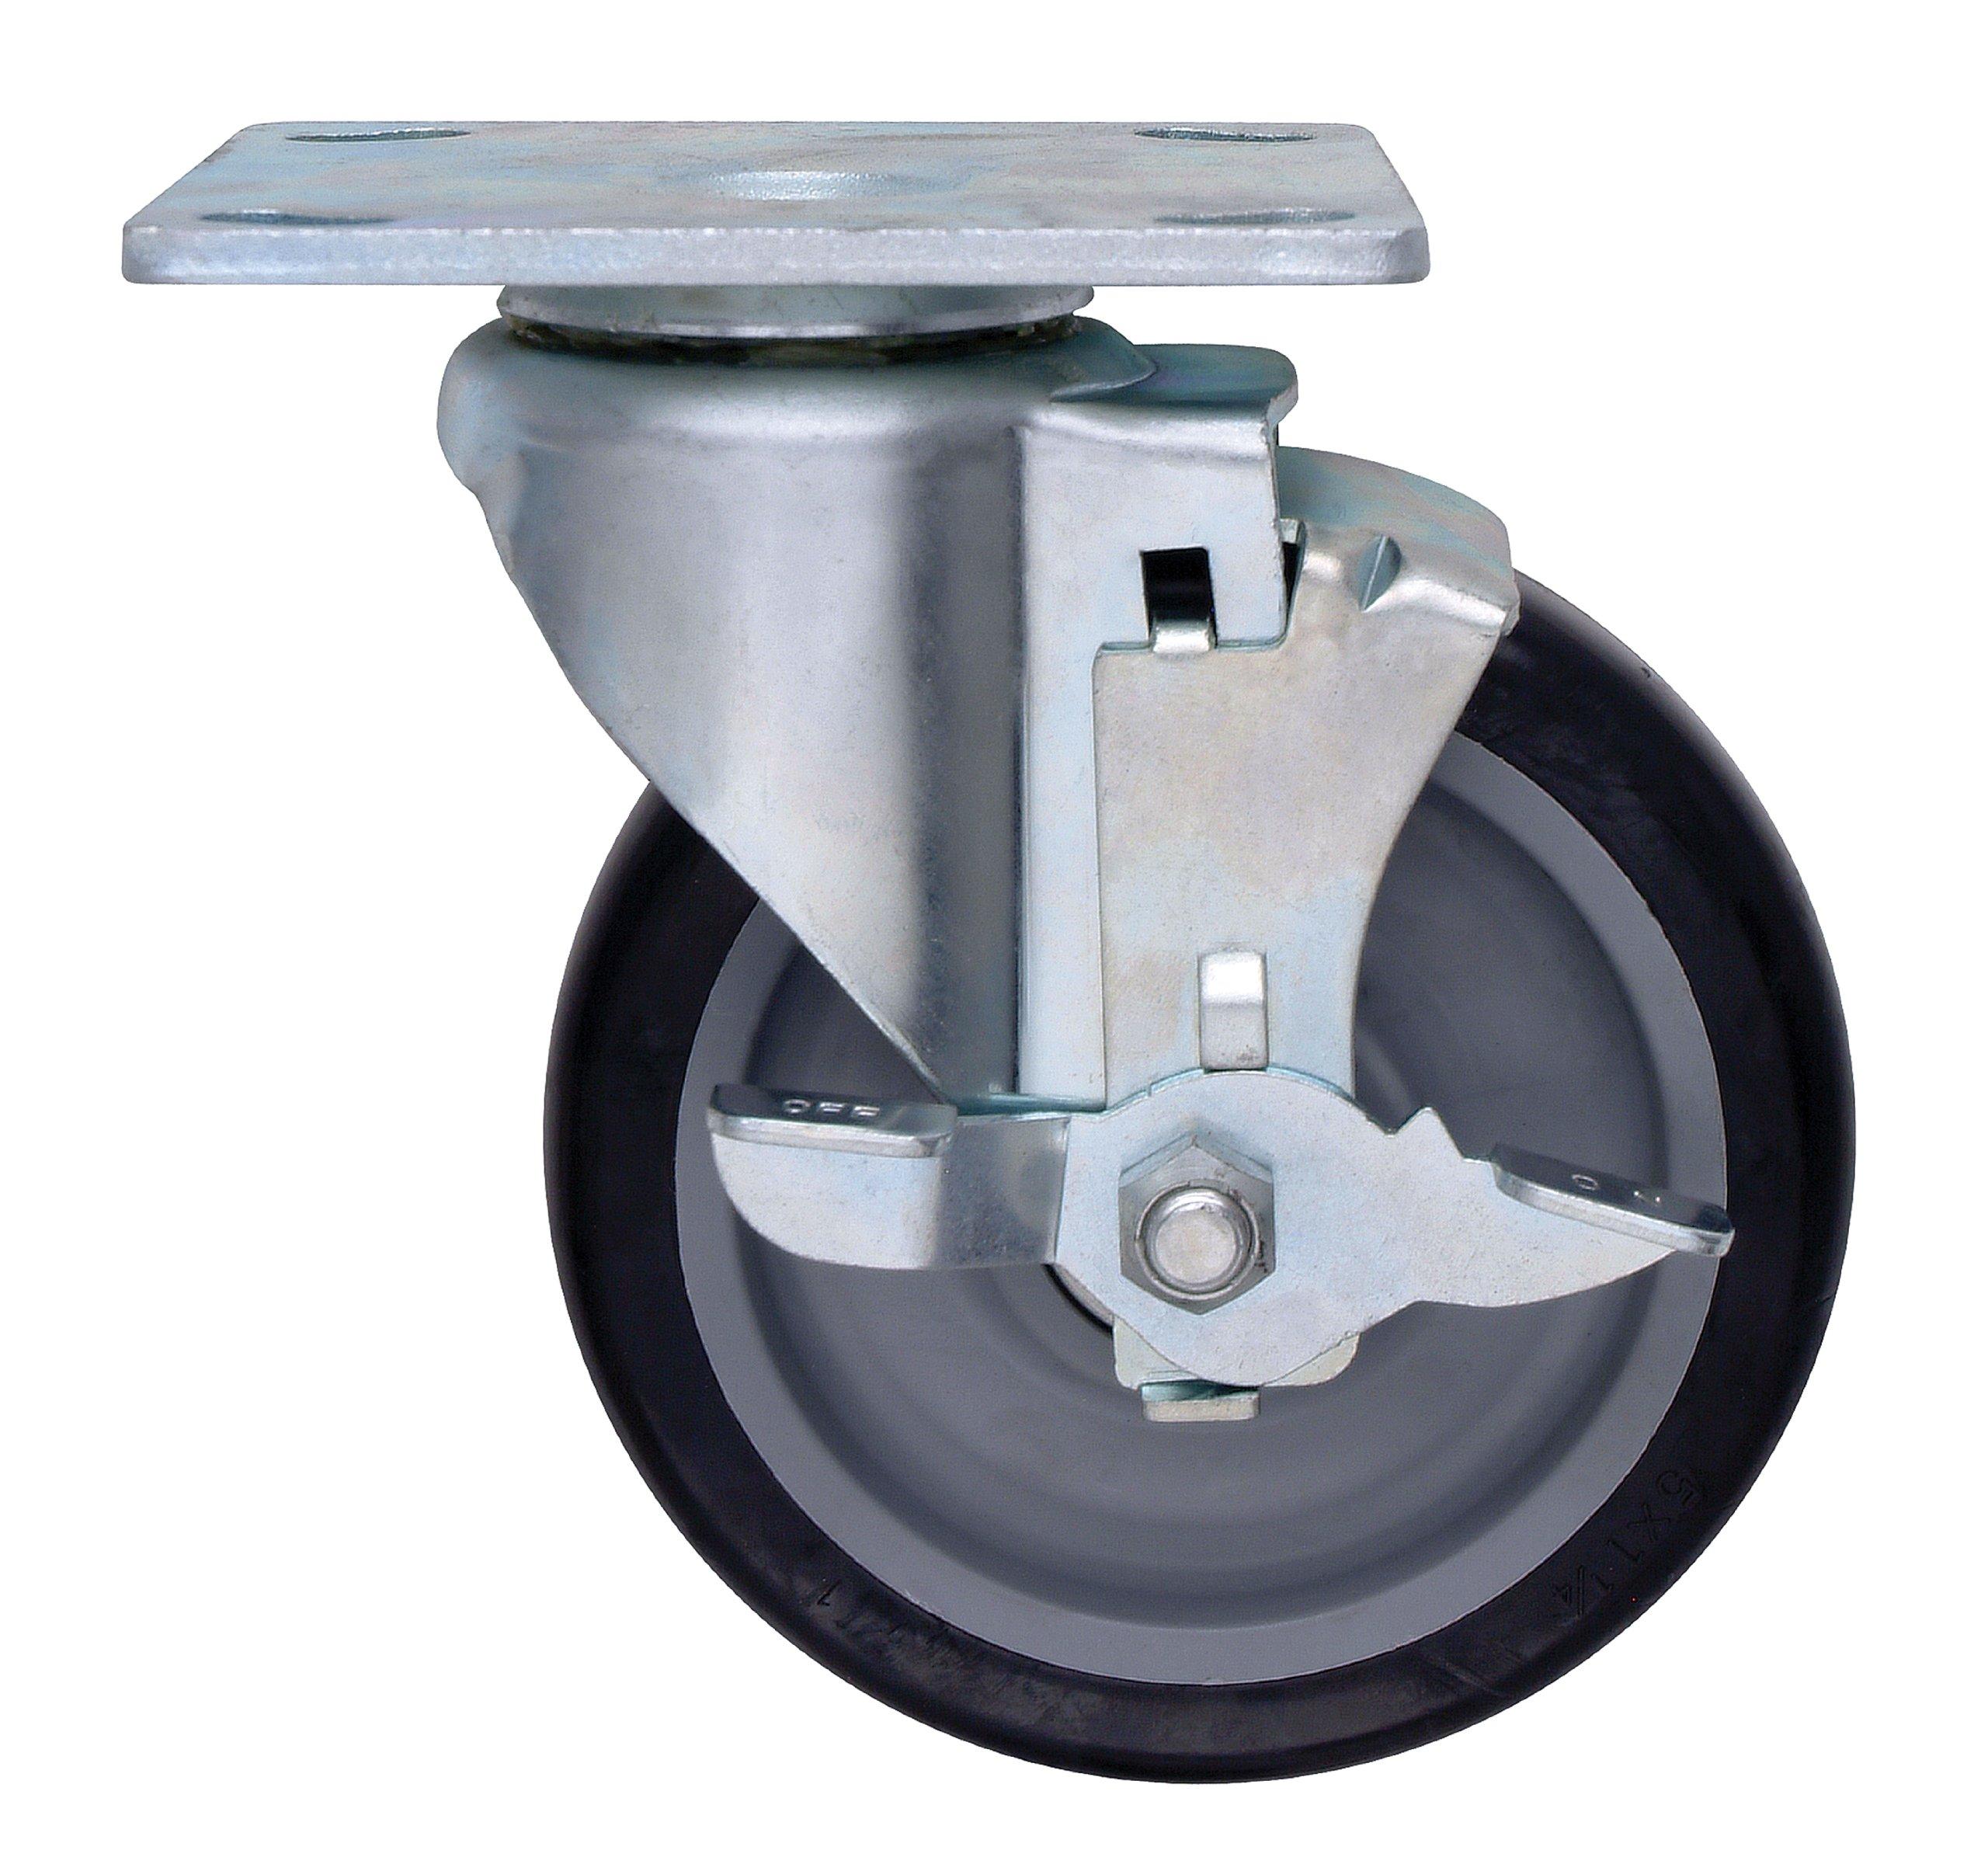 Quantum Storage Systems PT-PSB 1-1/4'' Diameter Polyurethane Wheel with Brake One Swivel Plate Caster, 300 lbs Capacity